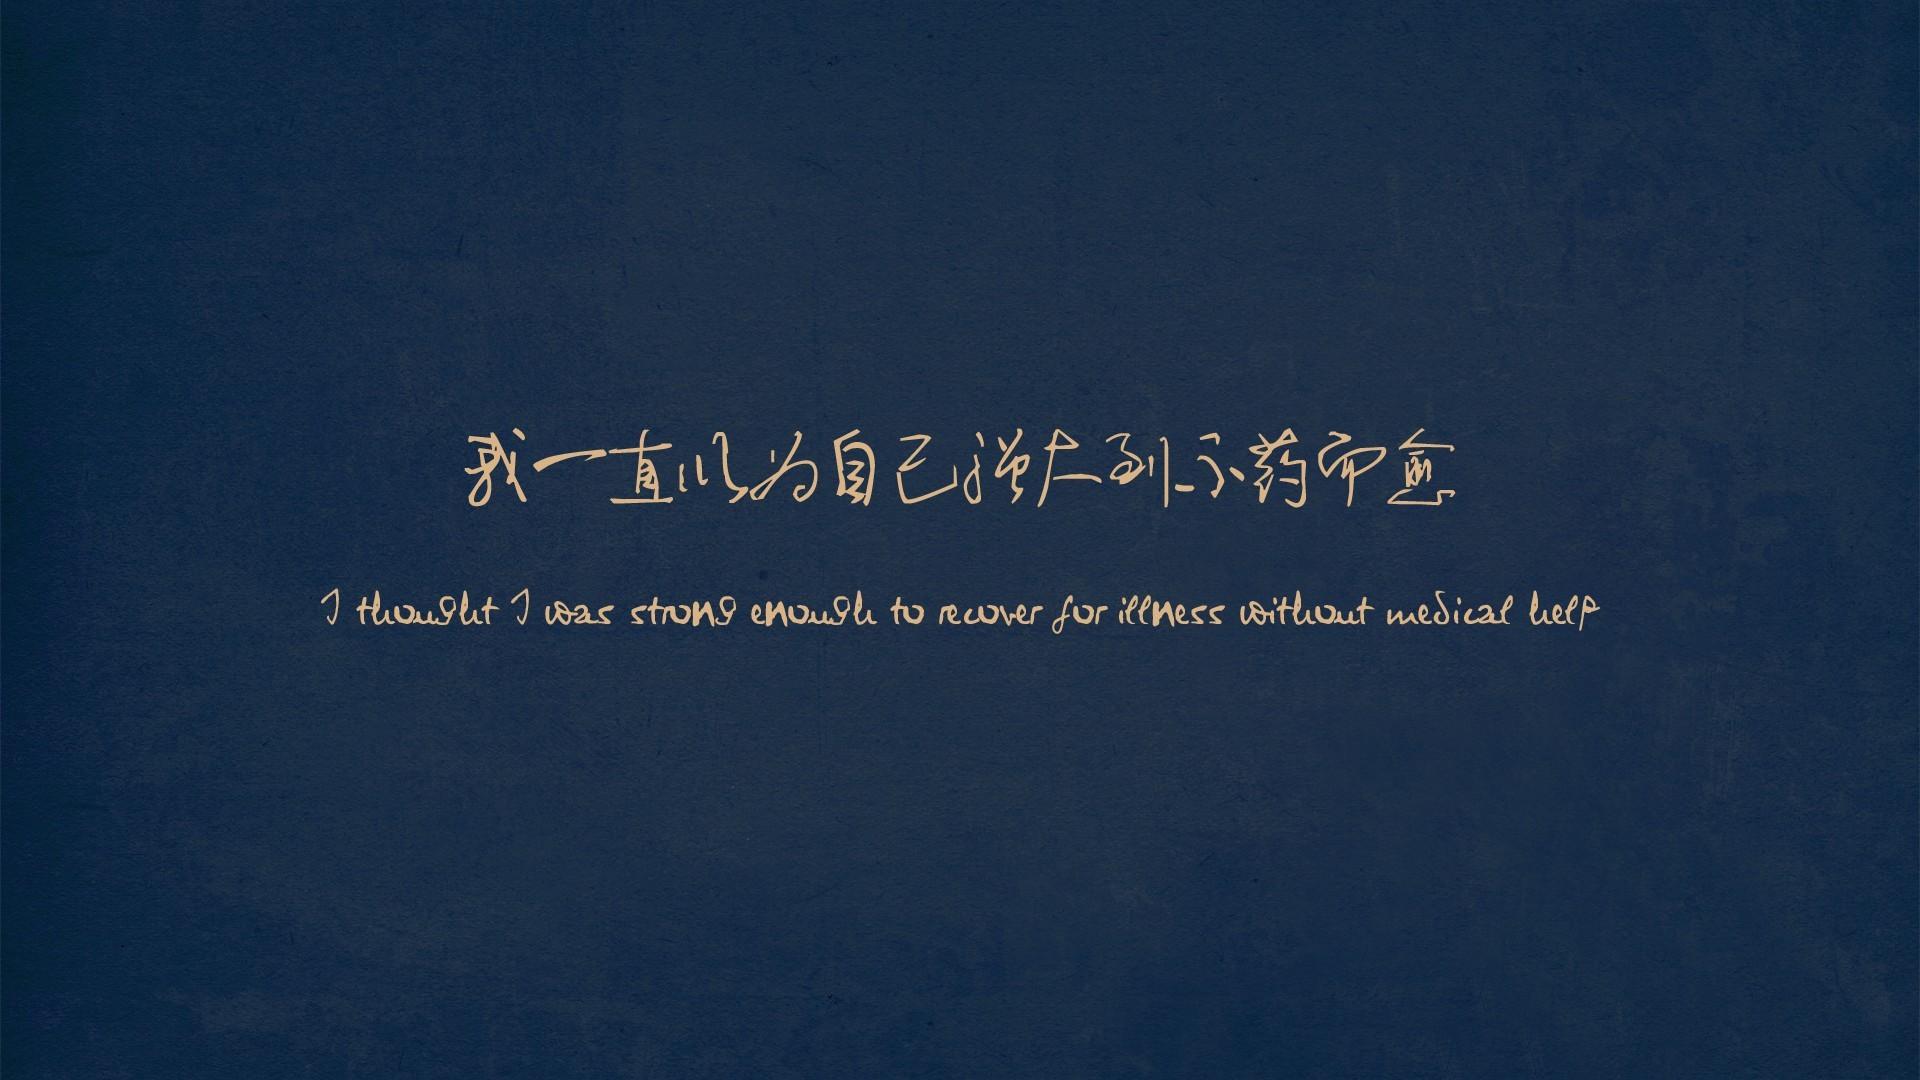 Wallpaper minimalism blue background typography text brand 1920x1080